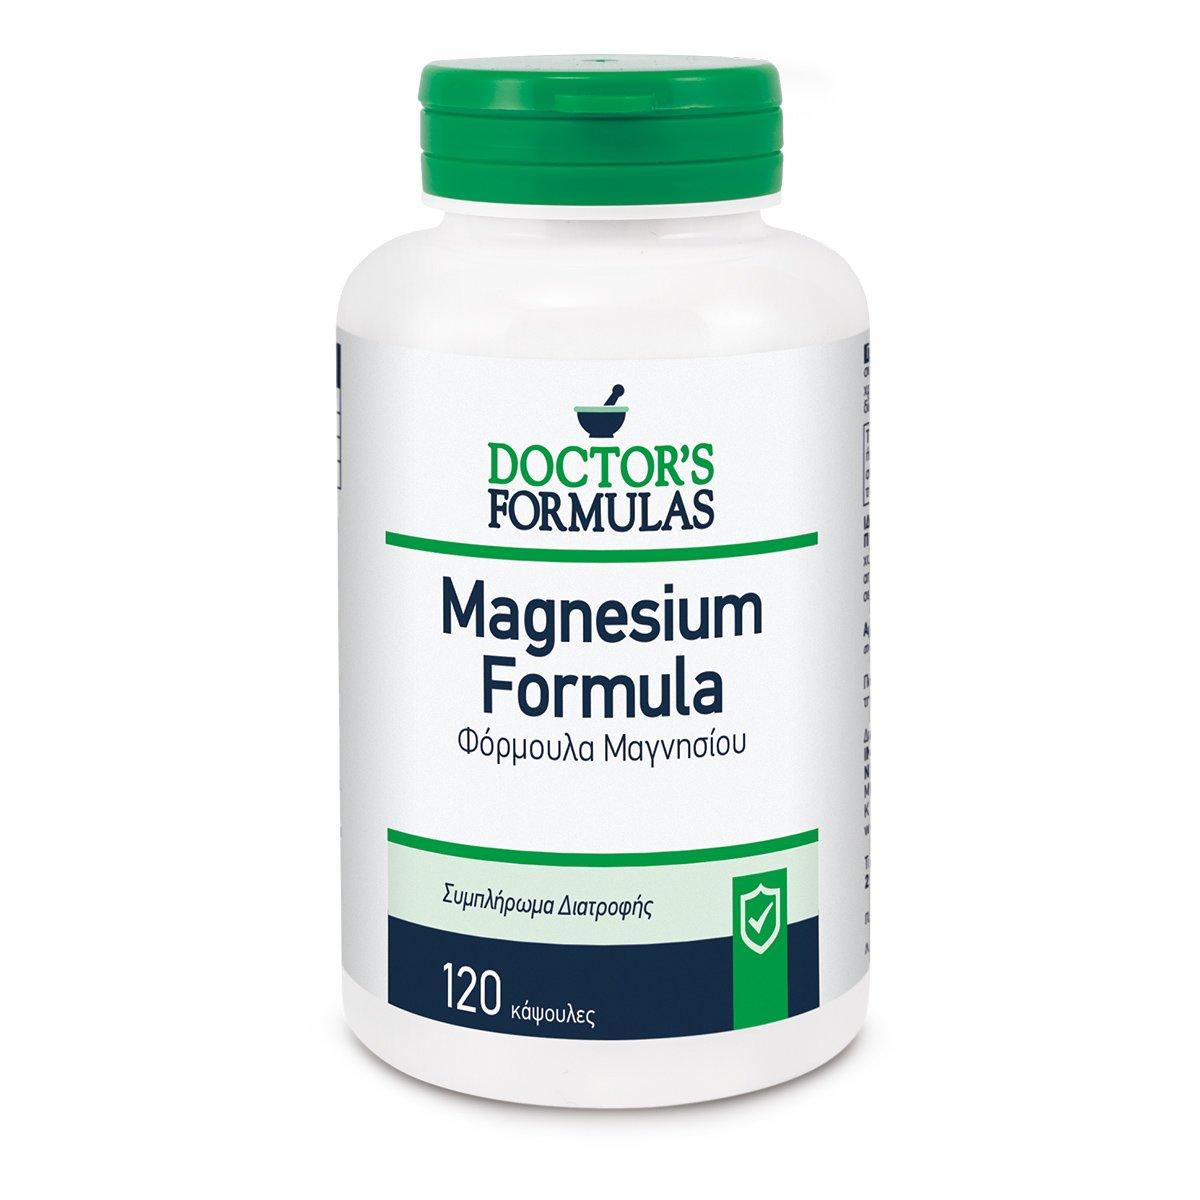 Doctor's Formulas Magnesium Φόρμουλα Μαγνησίου 120tabs